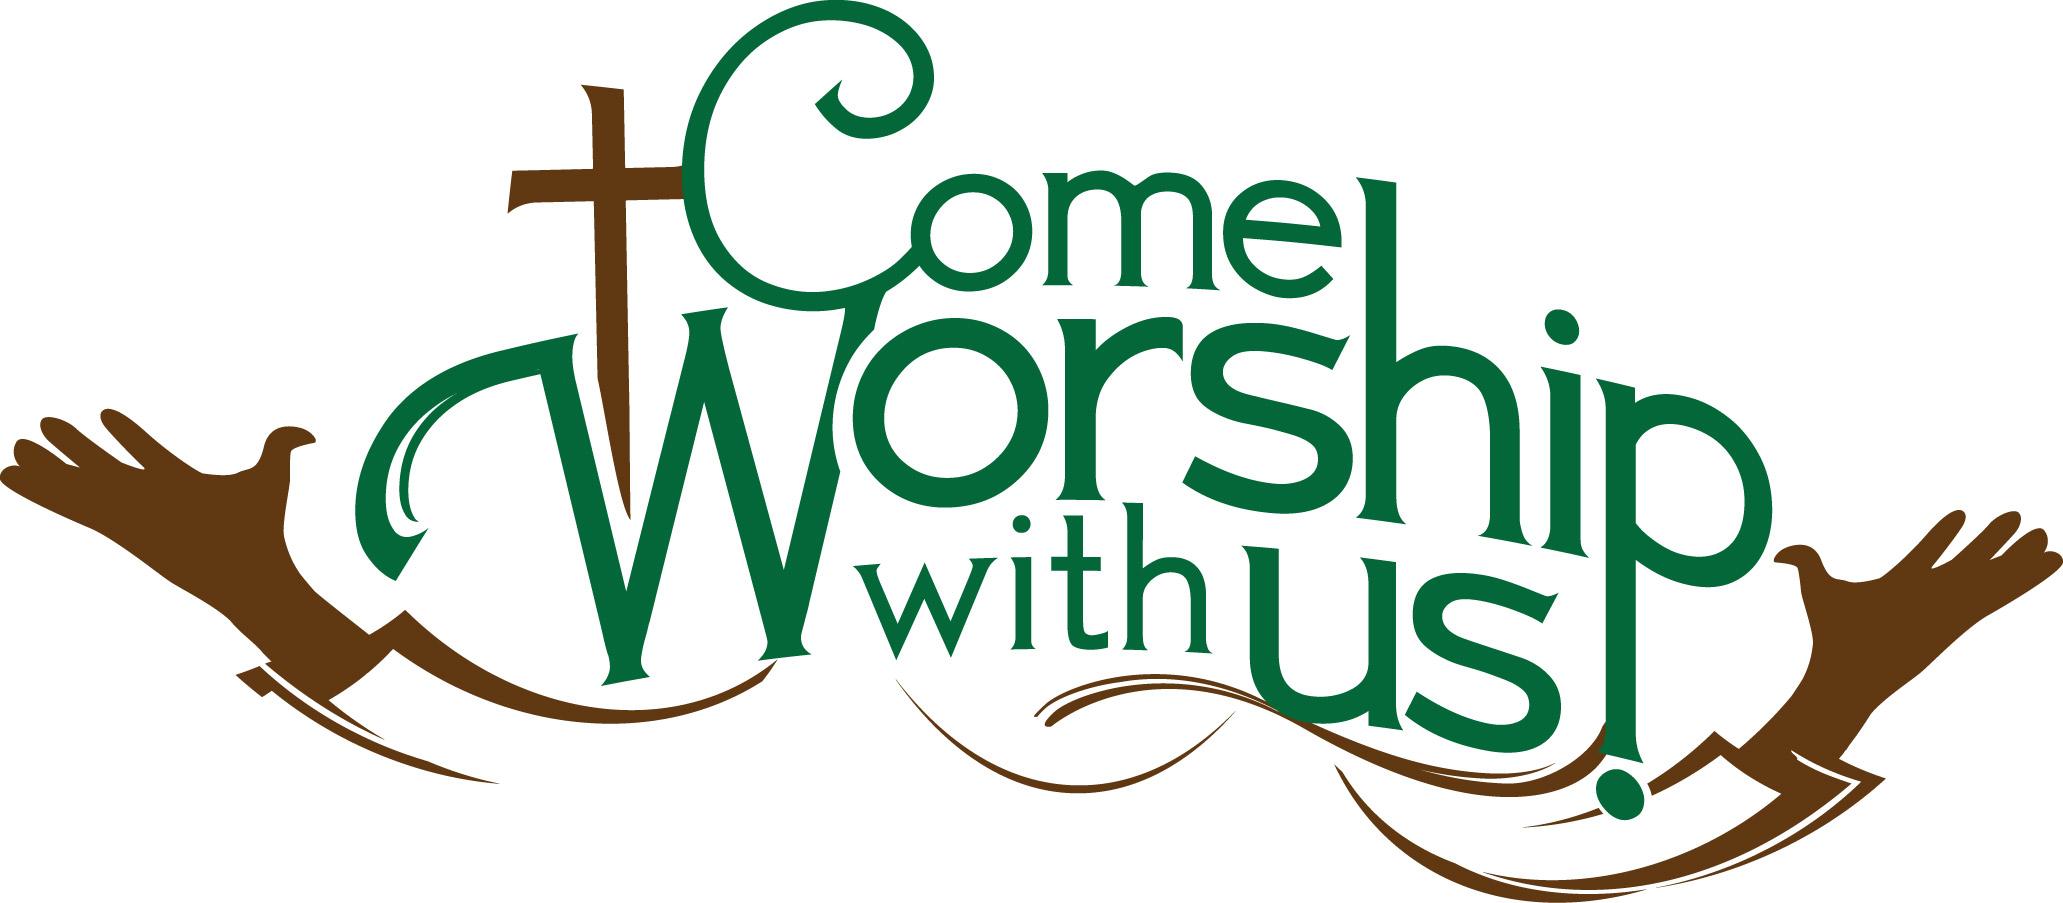 Sunday Worship Clip Art